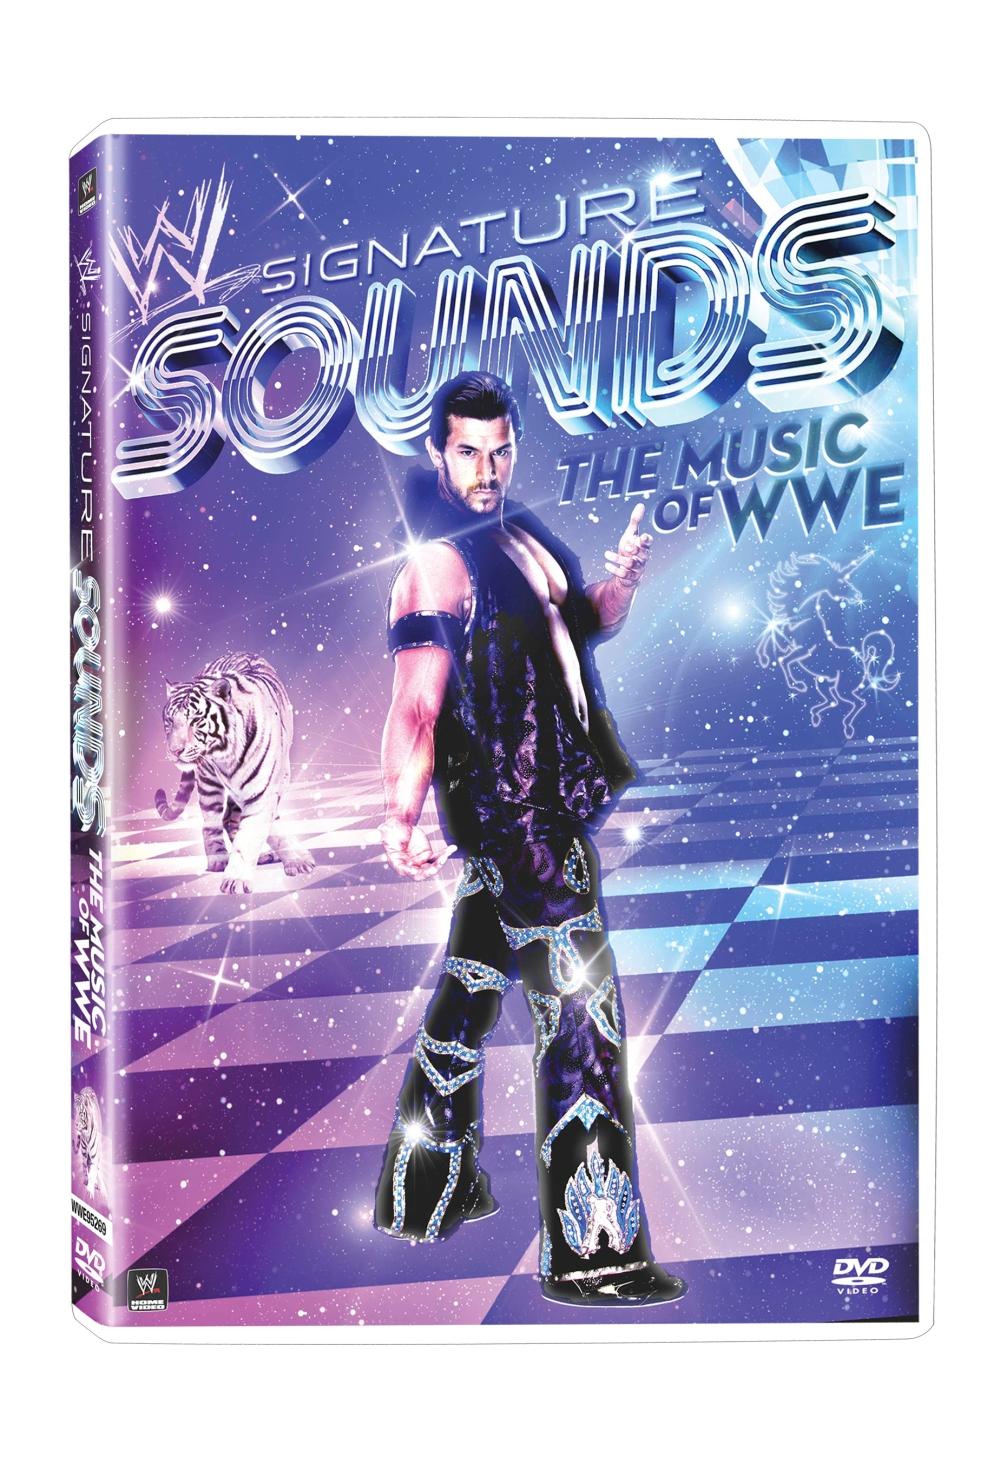 WWE Signature Sounds DVD cover art